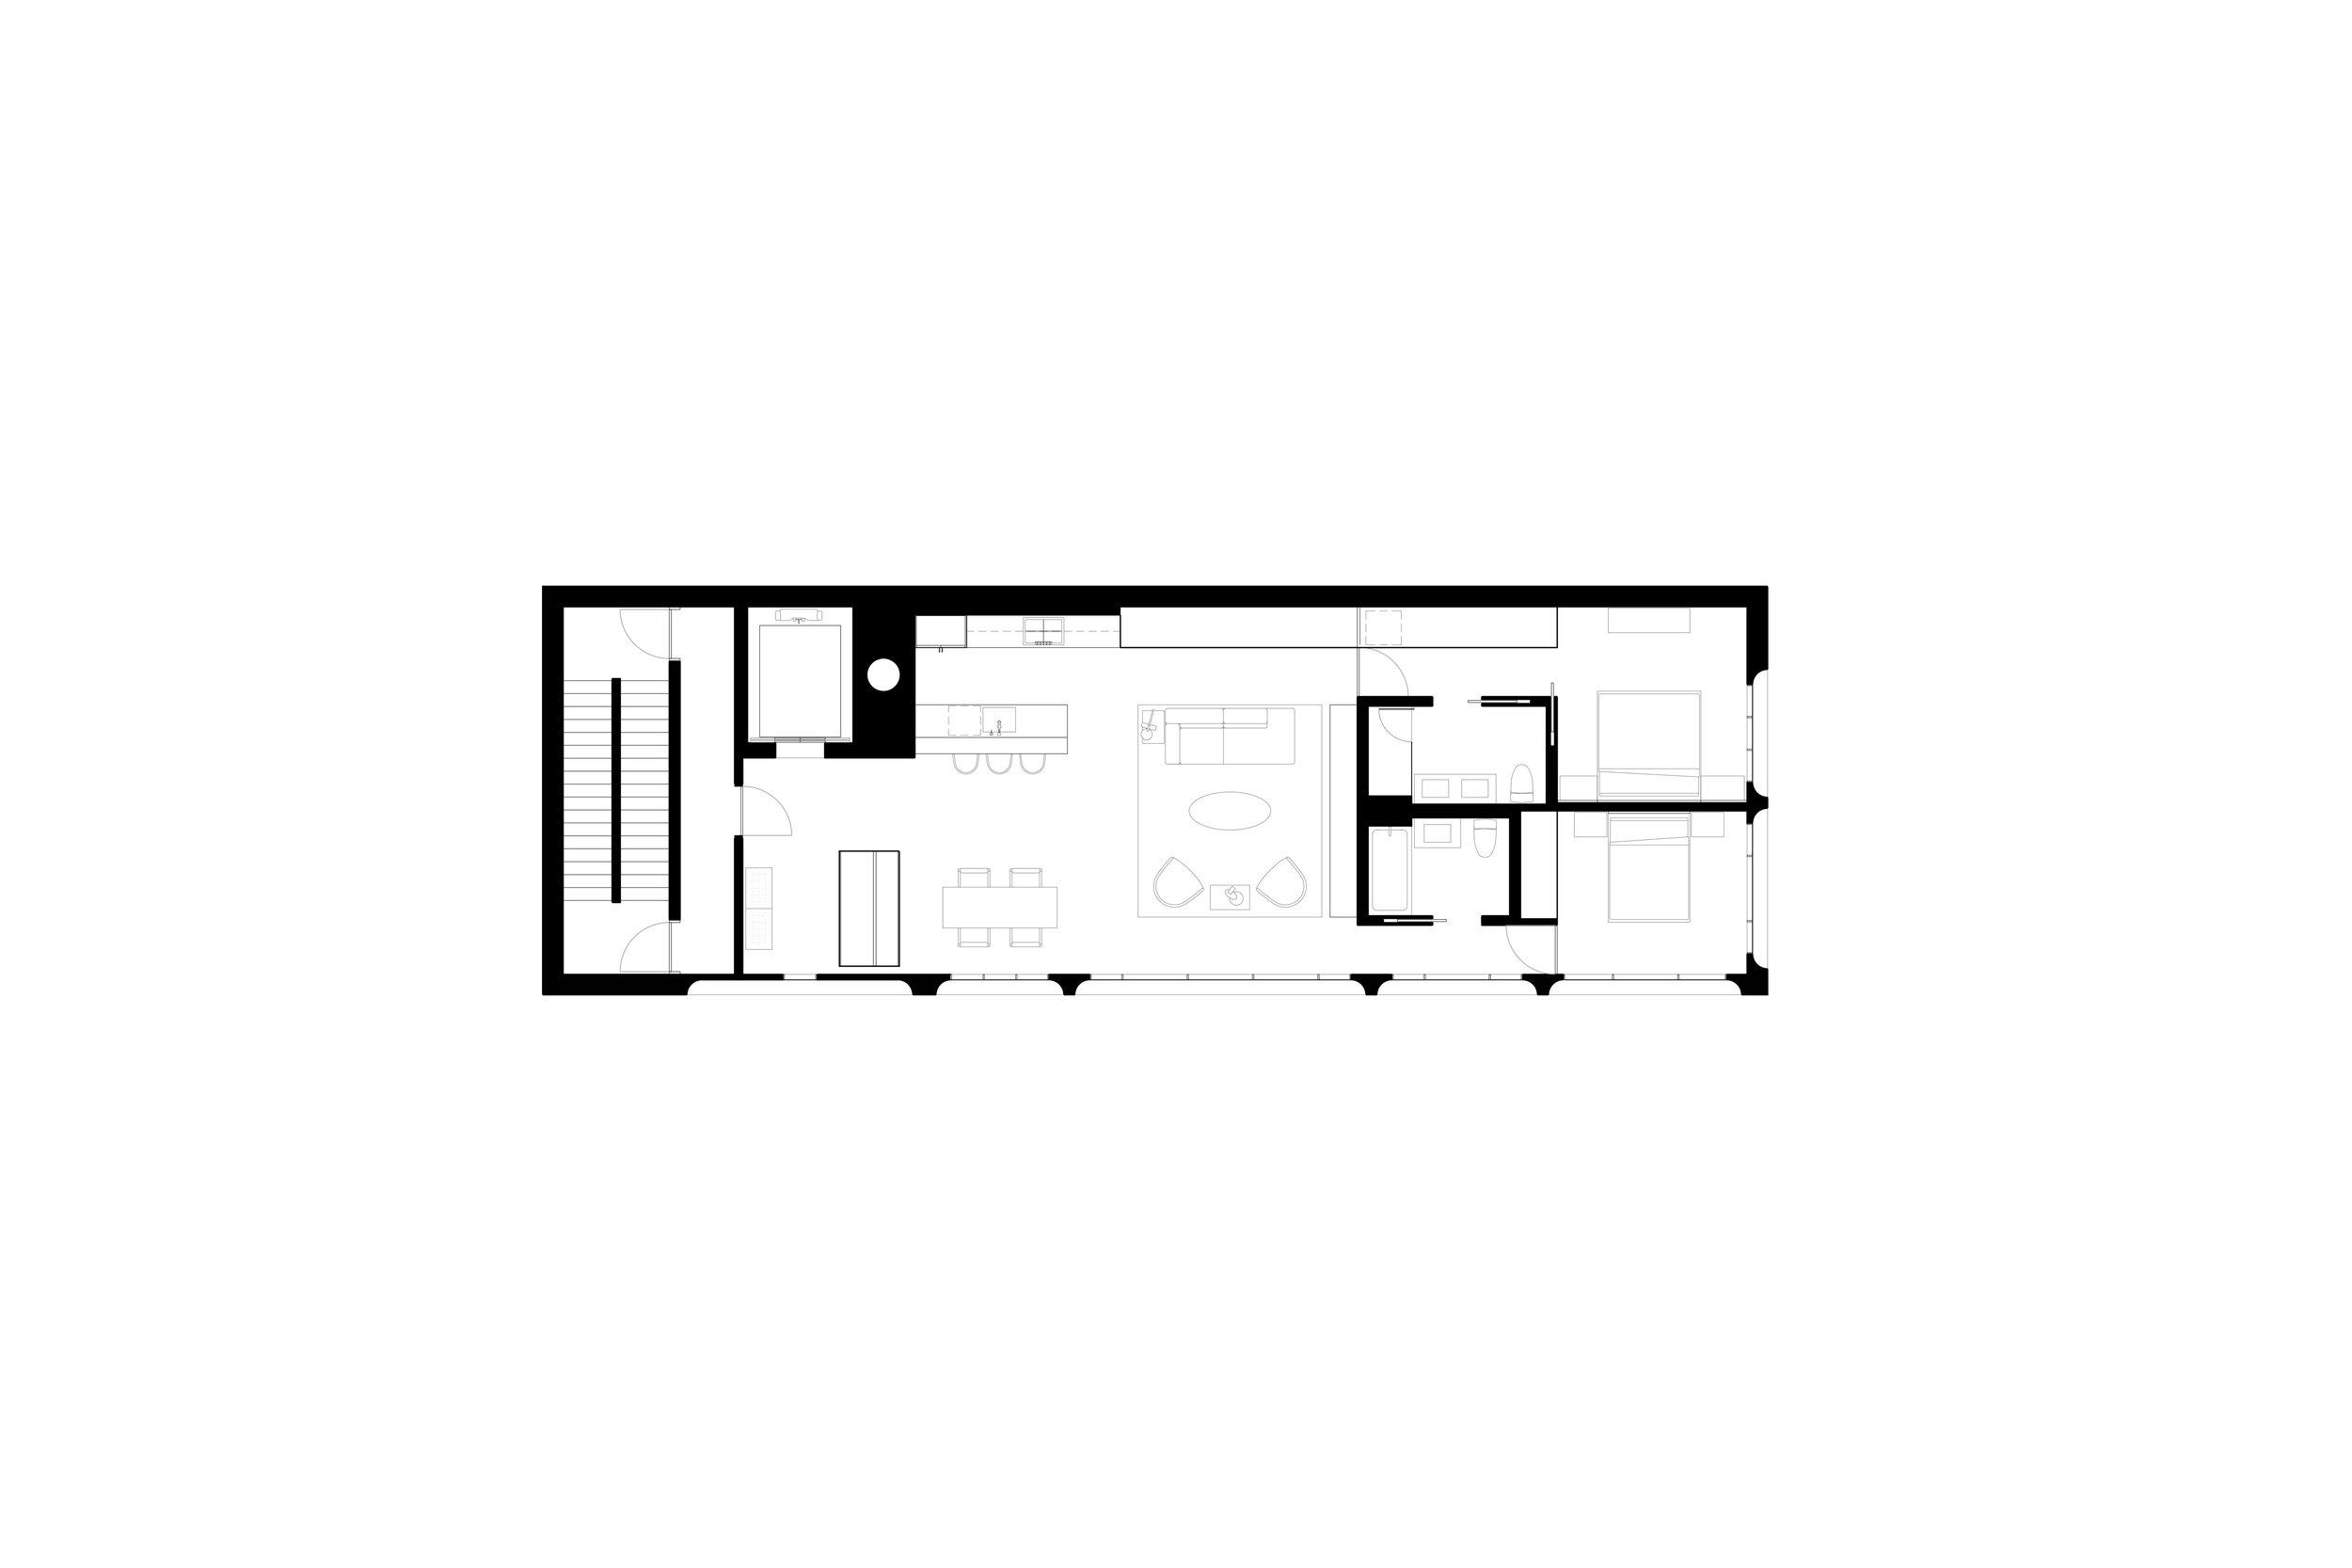 190110_Church & Chambers_2 BR Plan.jpg